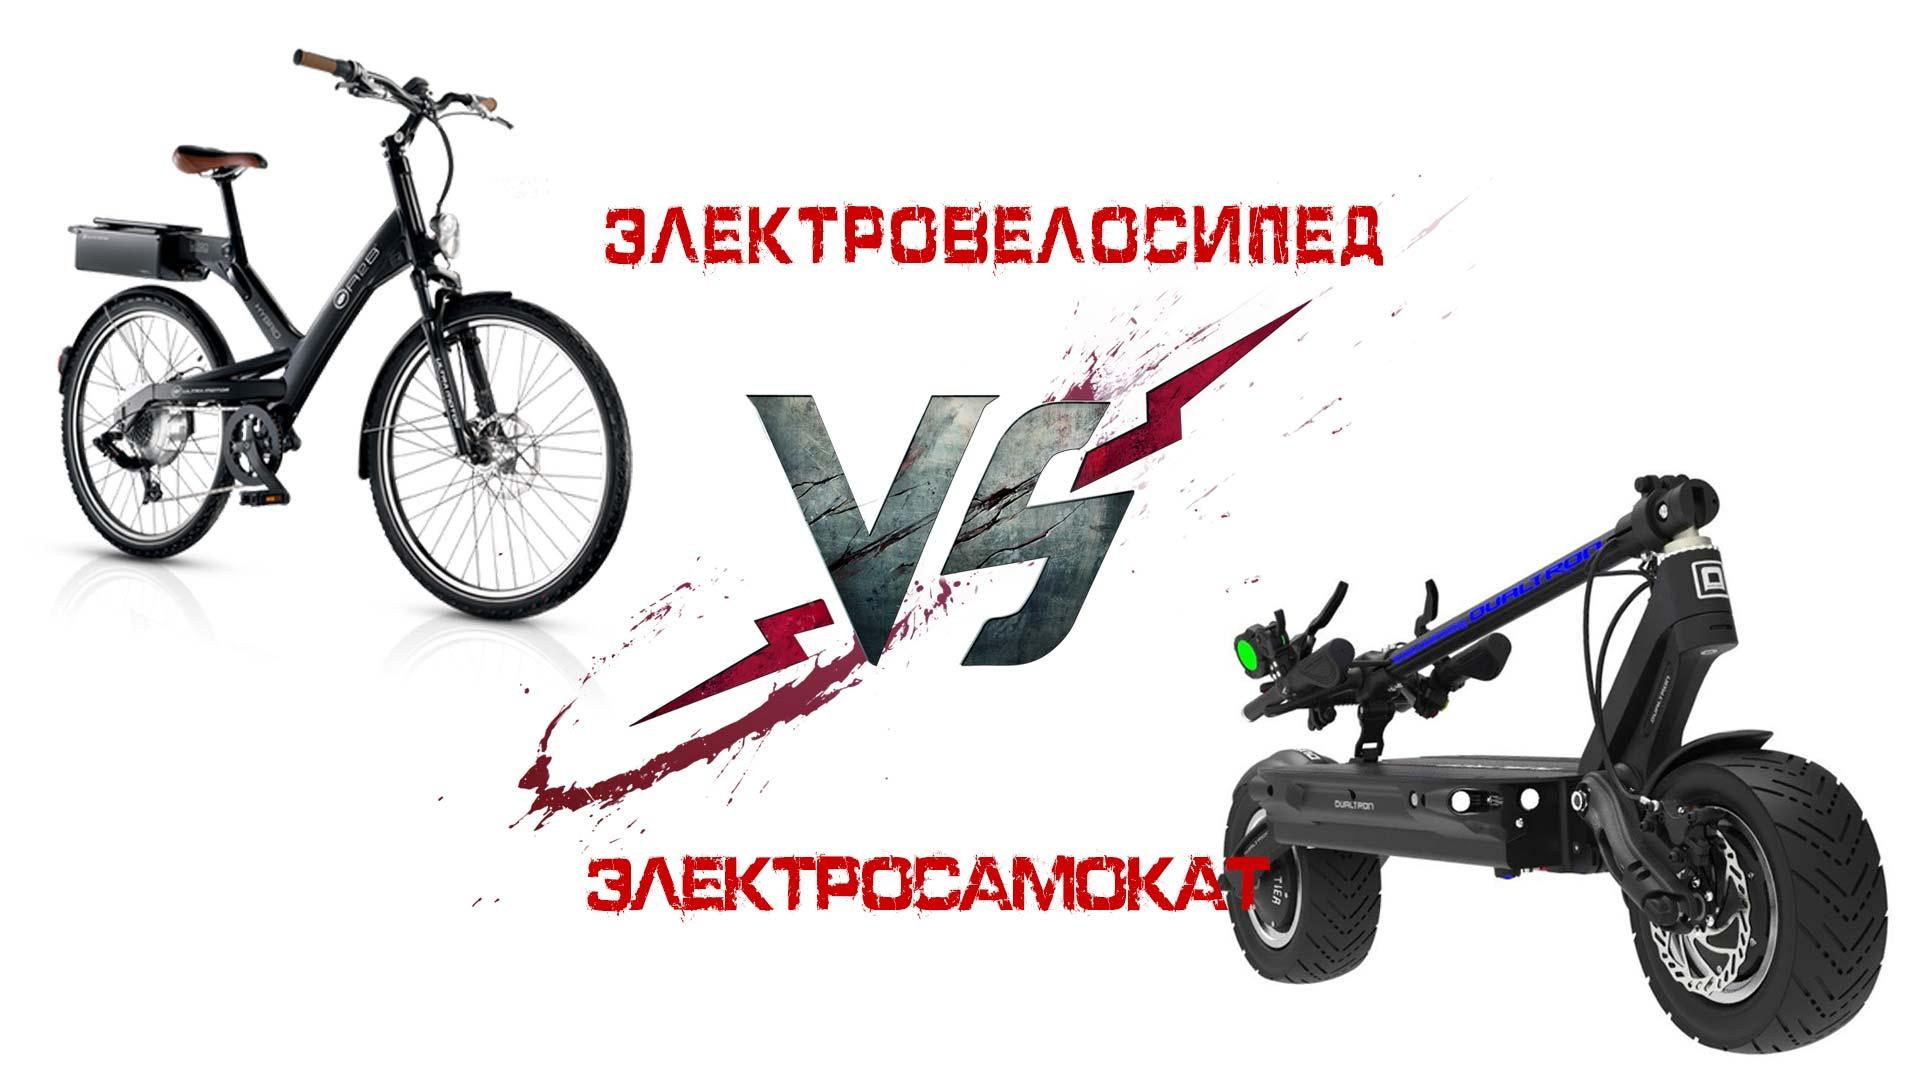 Электровелосипед или электросамокат